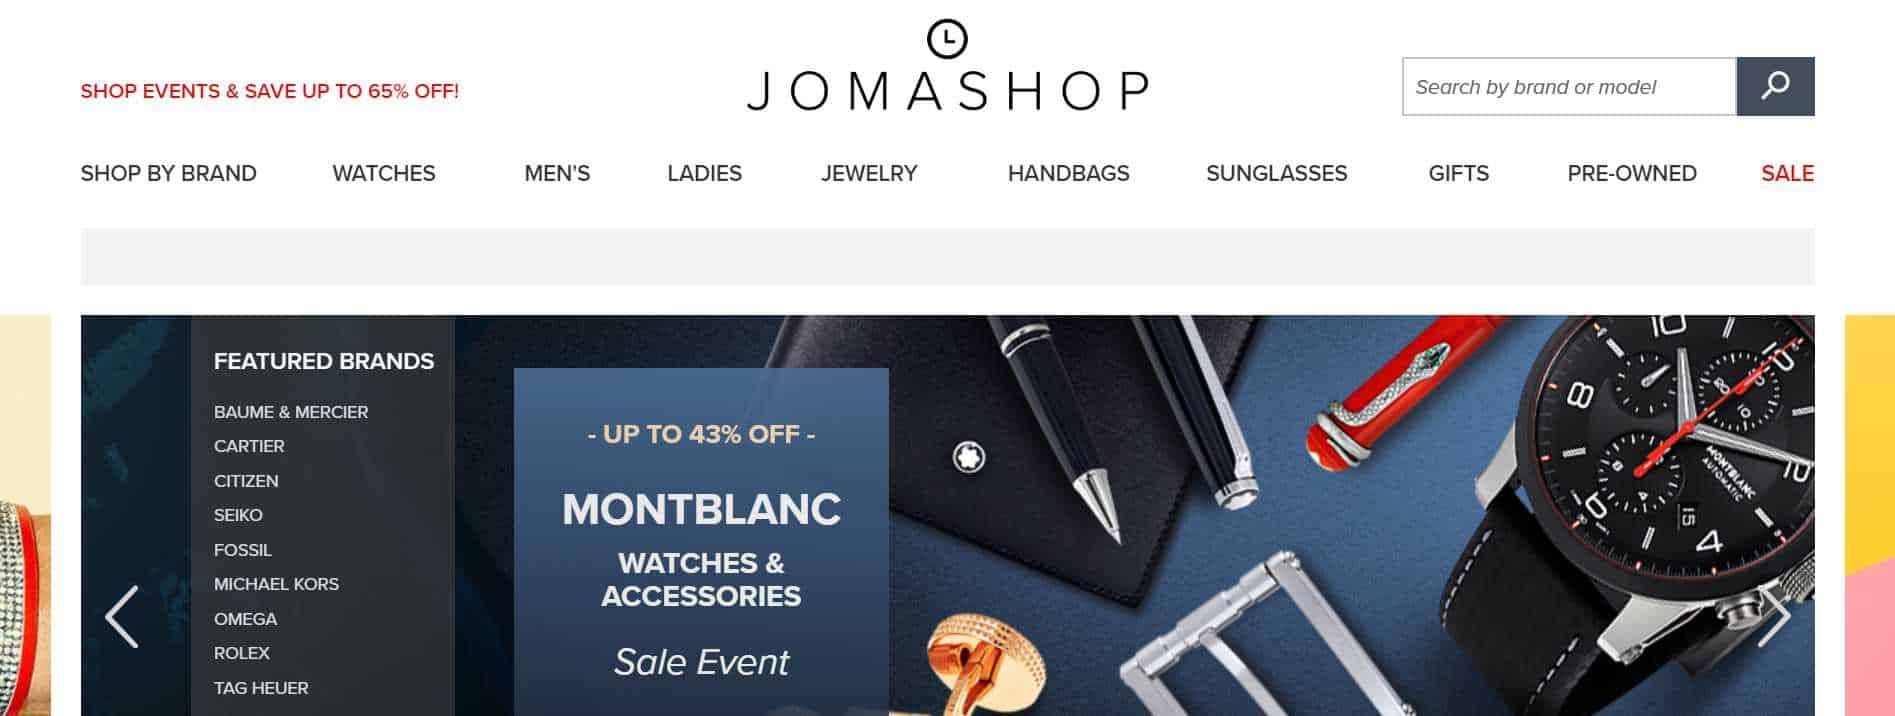 jomashop luxury watches online